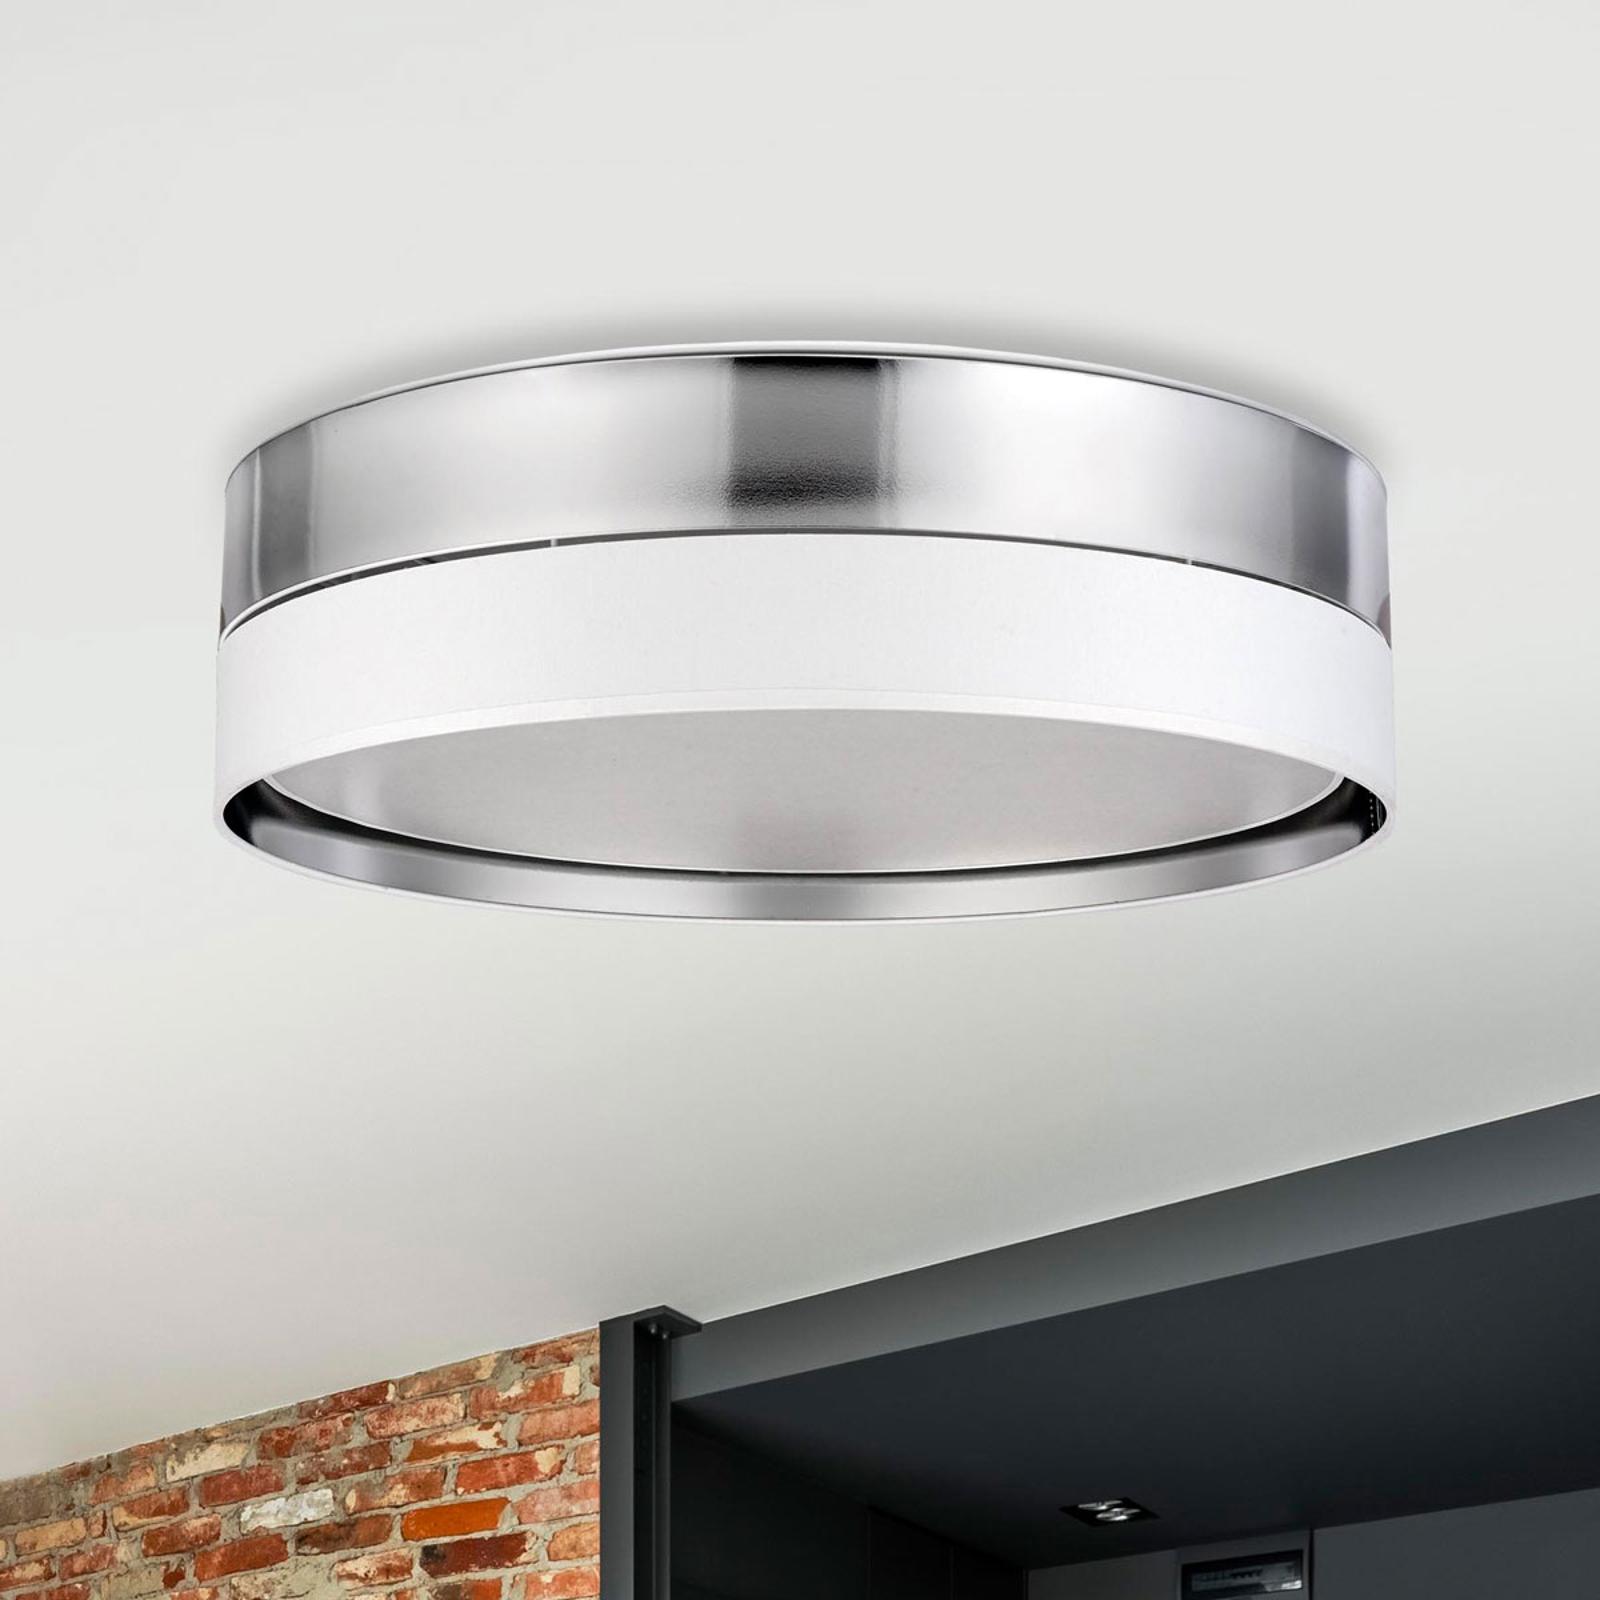 Hilton taklampe, hvit/sølv, Ø 60 cm